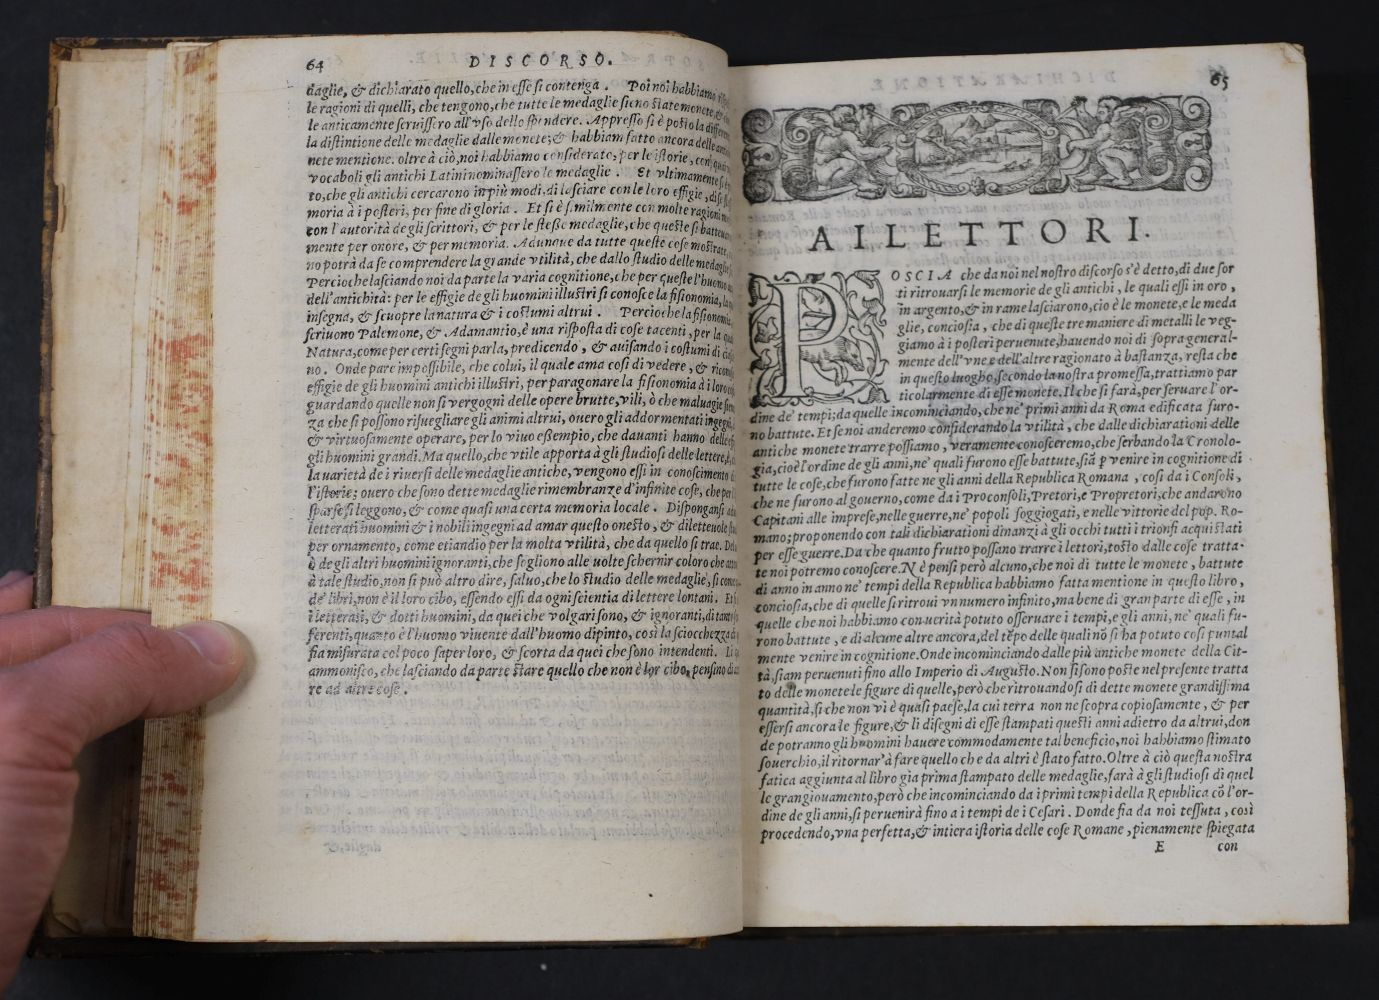 Erizzo (Sebastiano). Discorso sopra le medaglie, 4th edition, 1584, ex libris Fletcher of Saltoun - Image 8 of 11